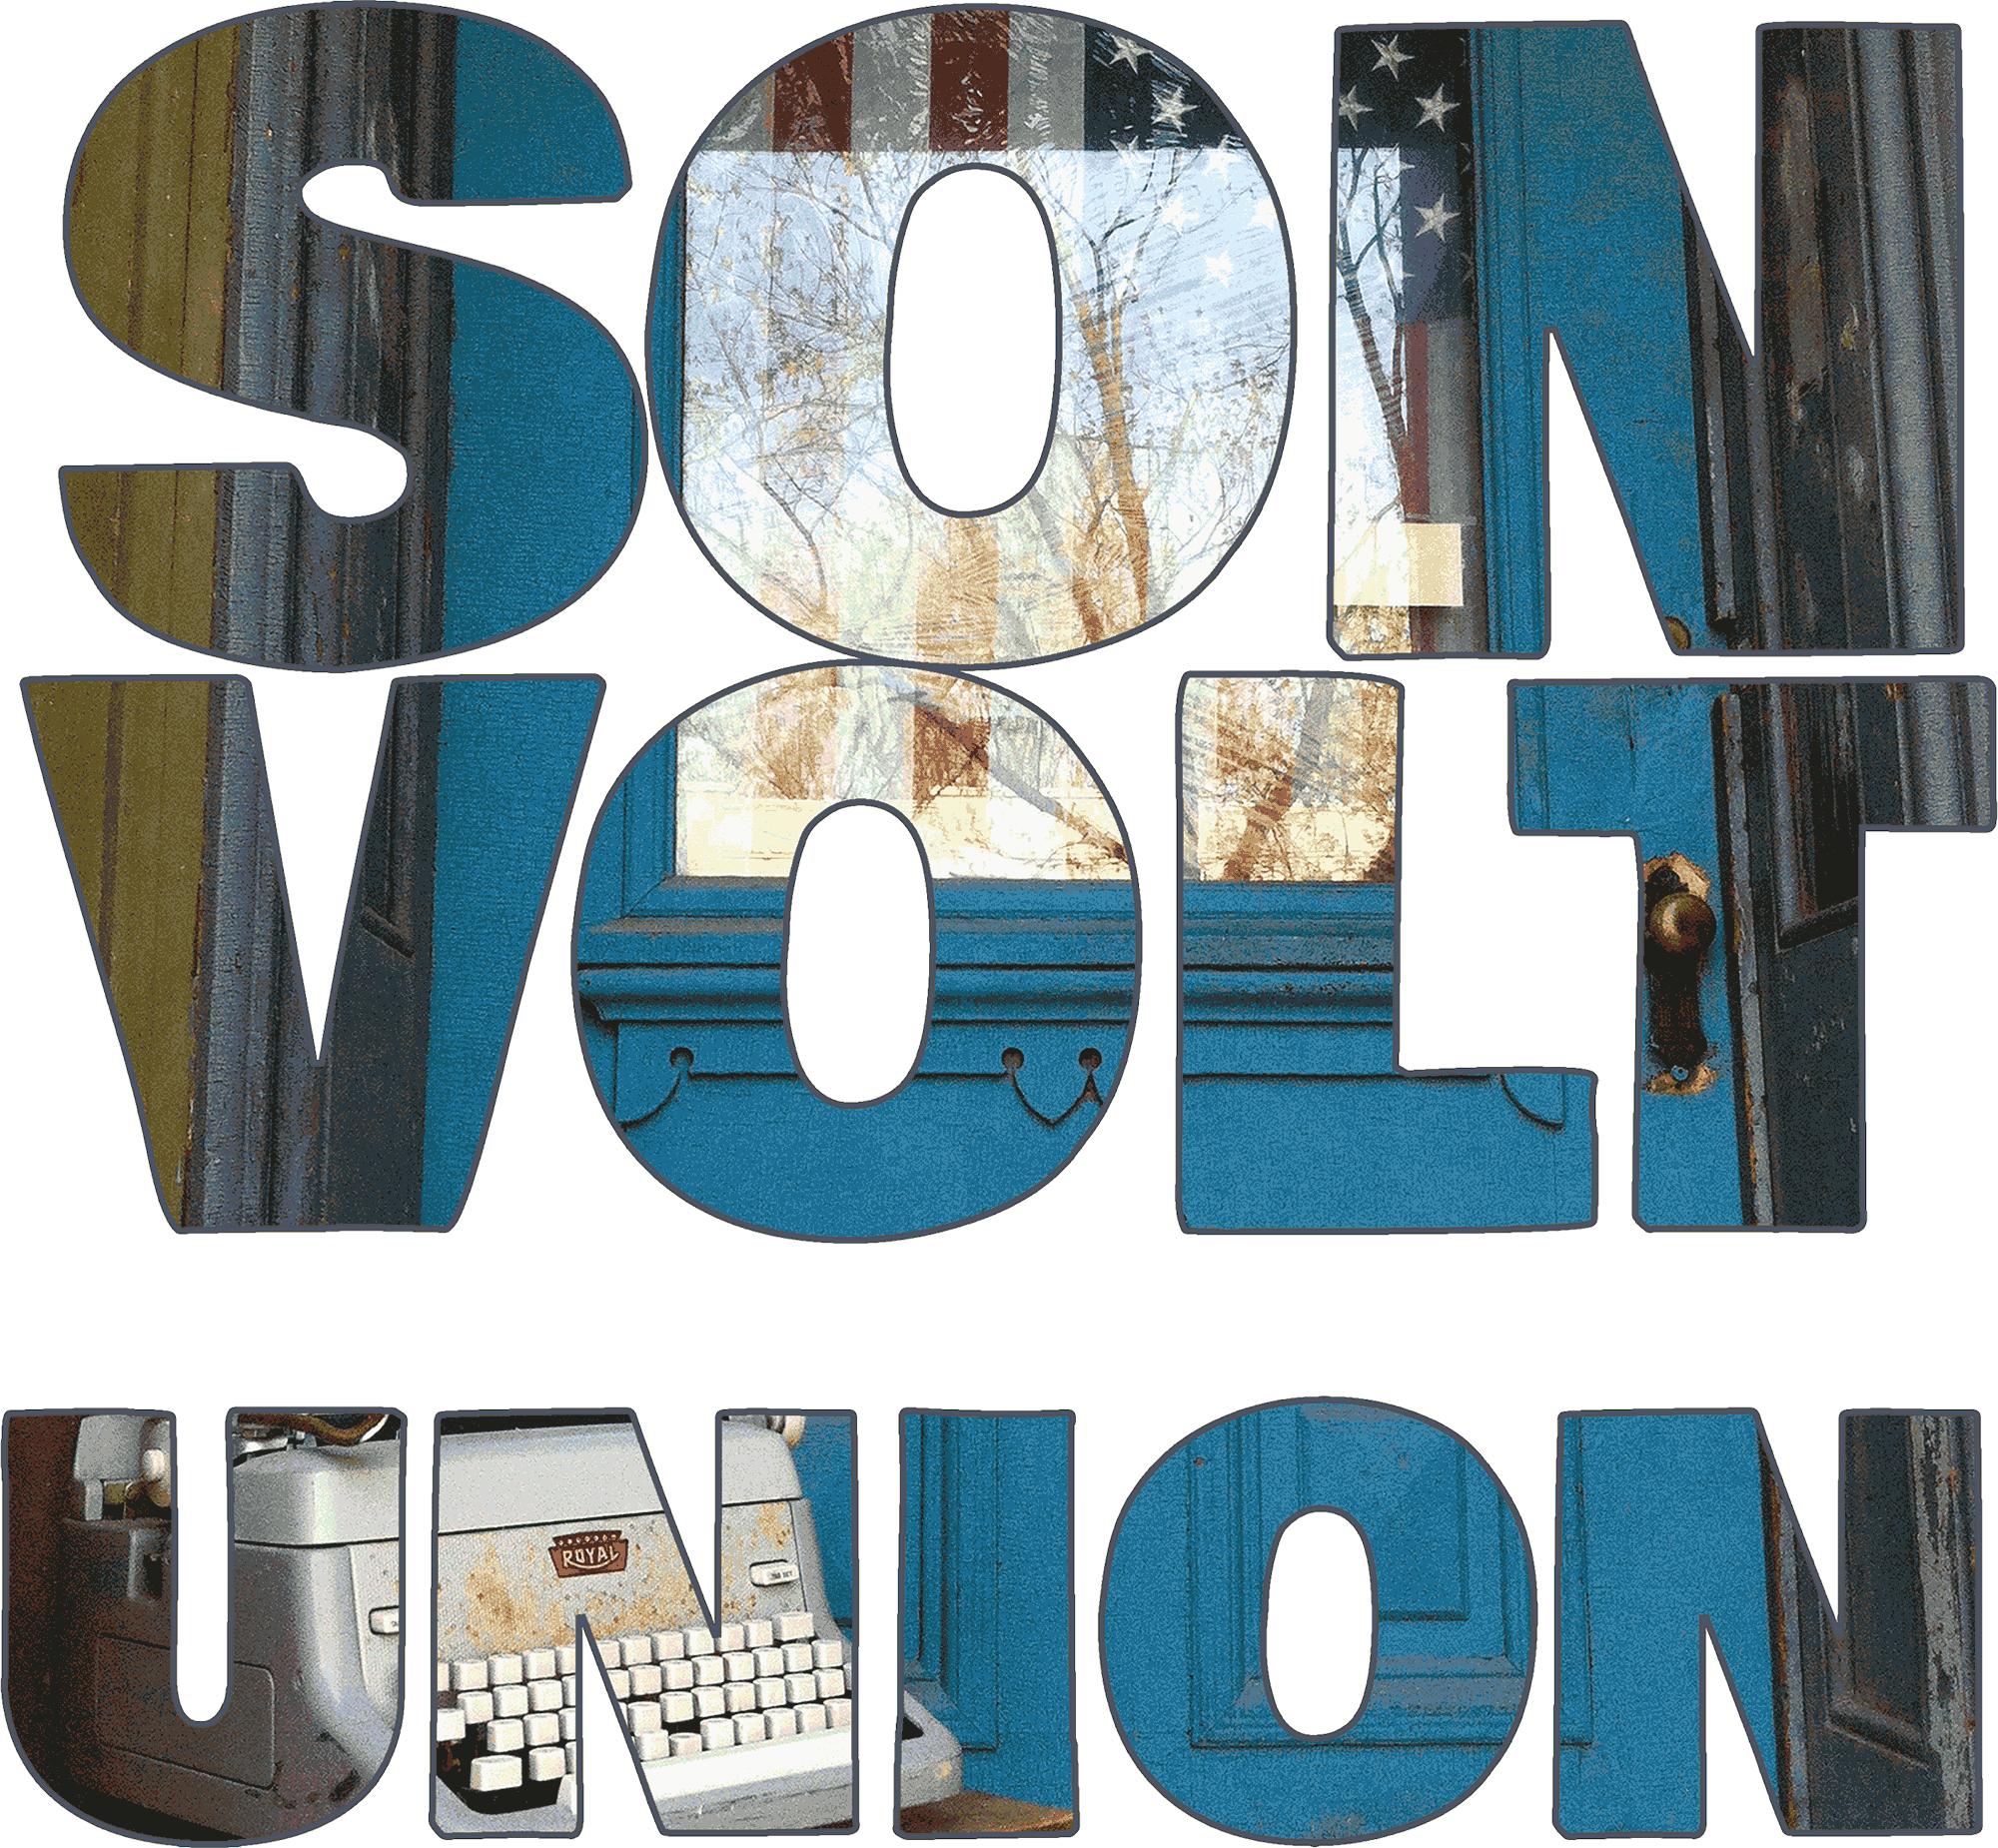 HOME PAGE - Son Volt